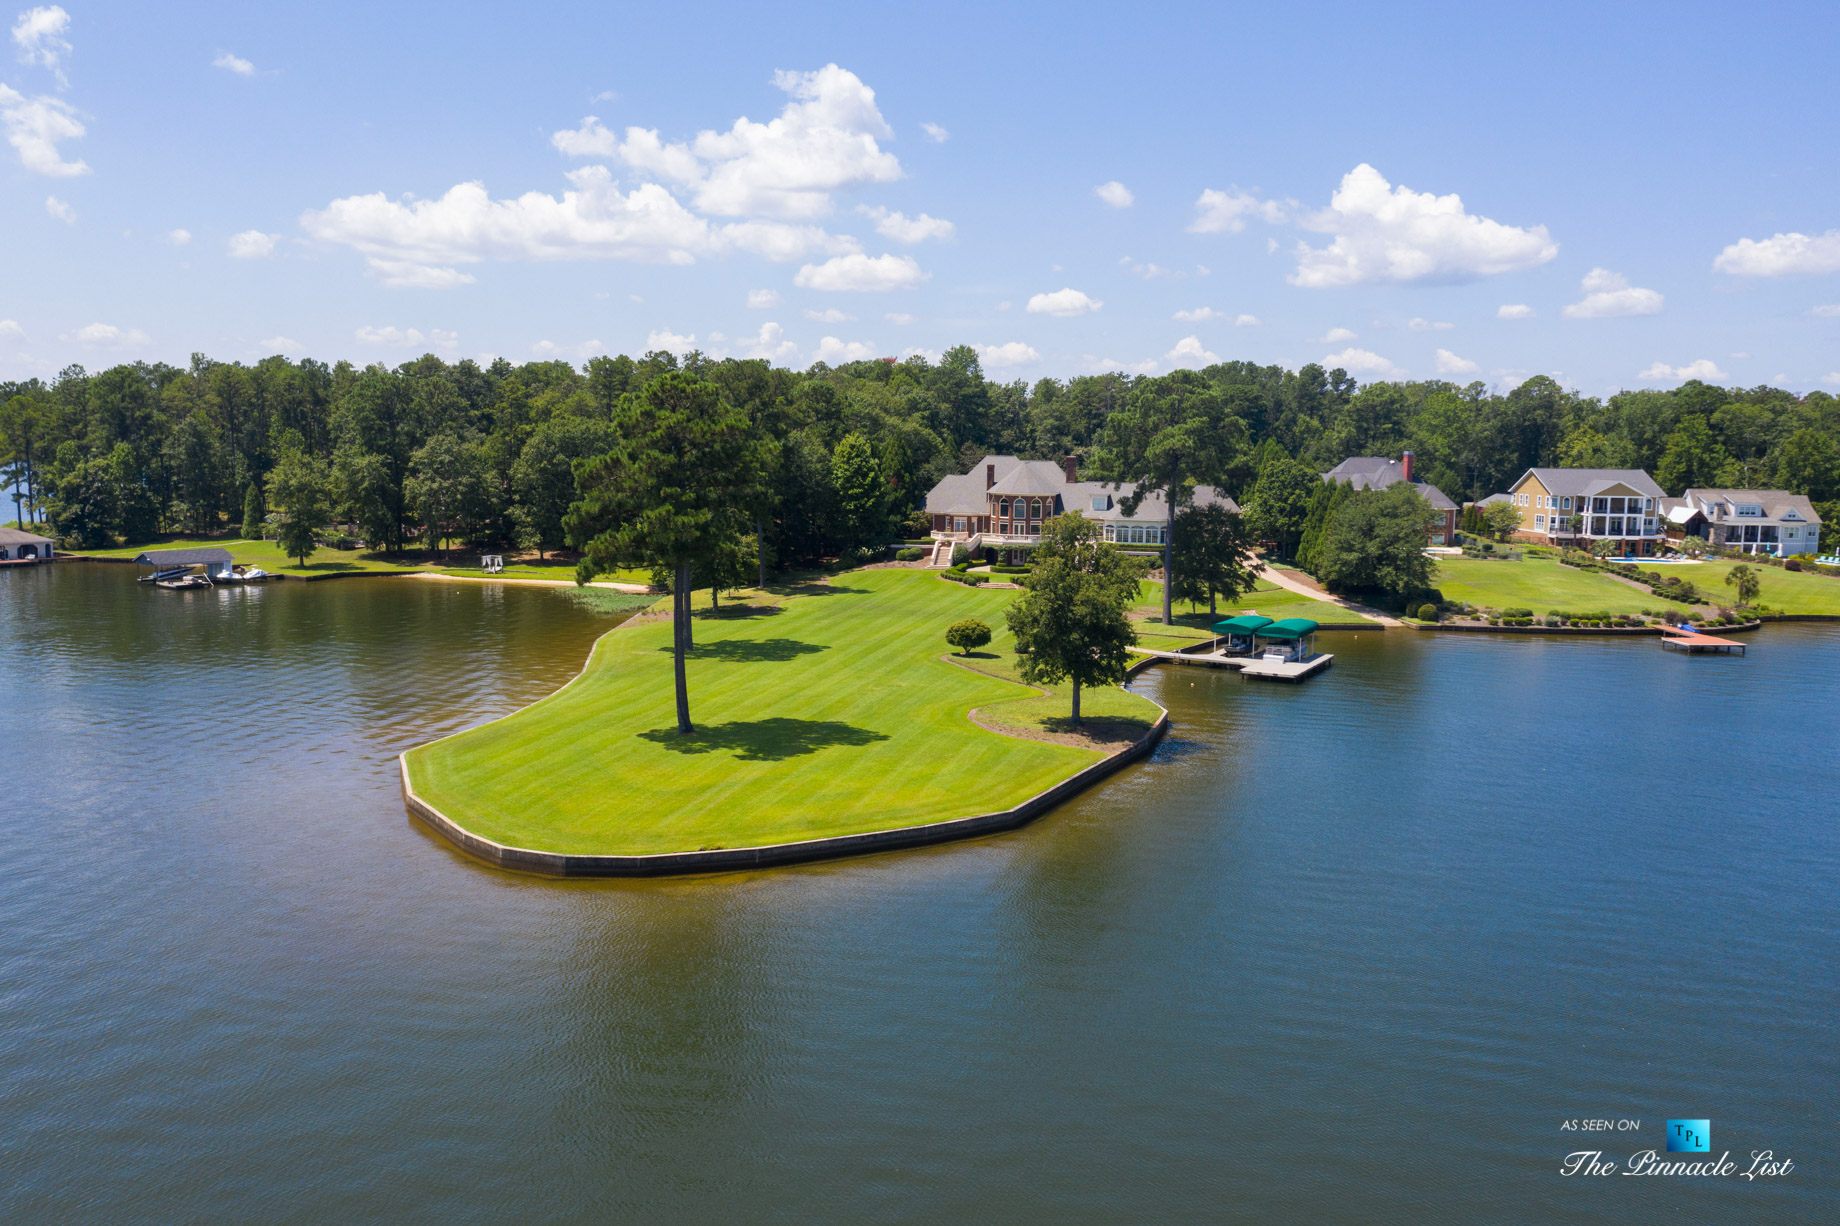 215 Lakecrest Dr NE, Milledgeville, GA, USA